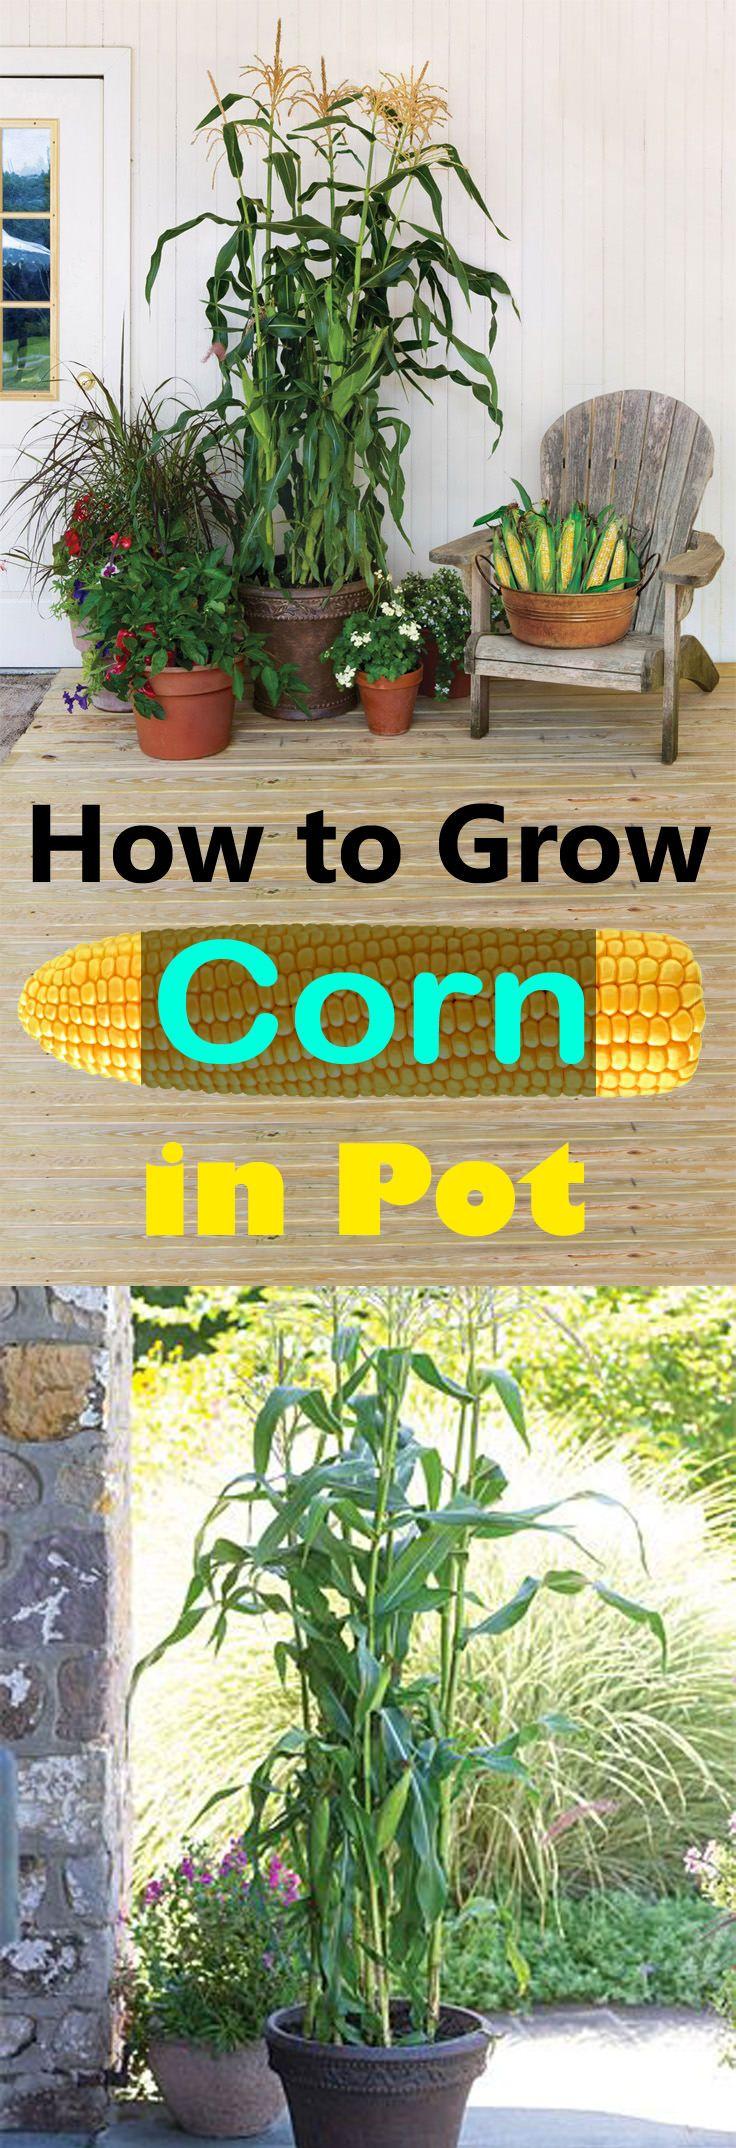 Kitchen Gardeners International 17 Best Ideas About Container Gardening On Pinterest Growing